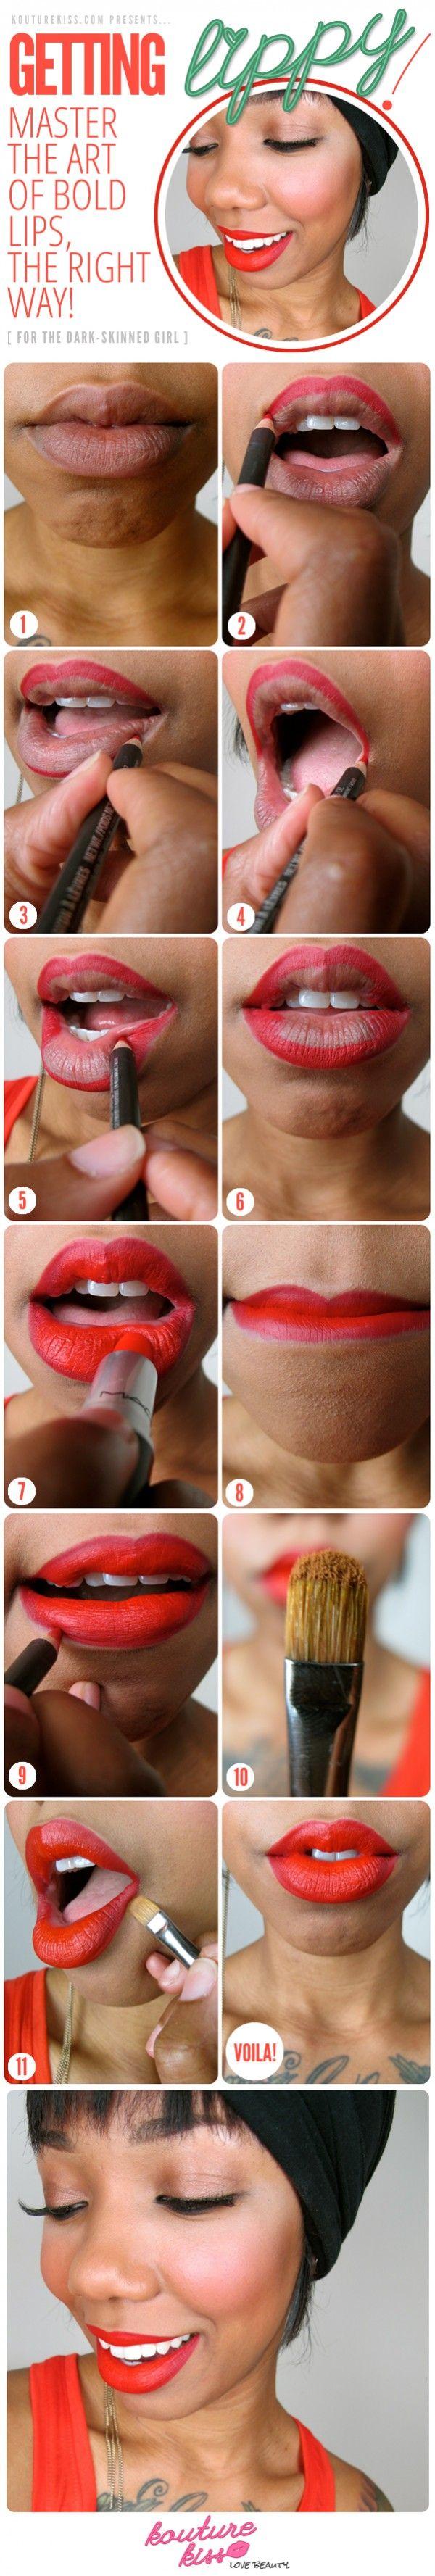 Getting Lippy! Bold Lips For The Dark Skinned Girl - Kouturekiss - Your One Stop Everything Beauty Spot - kouturekiss.com.